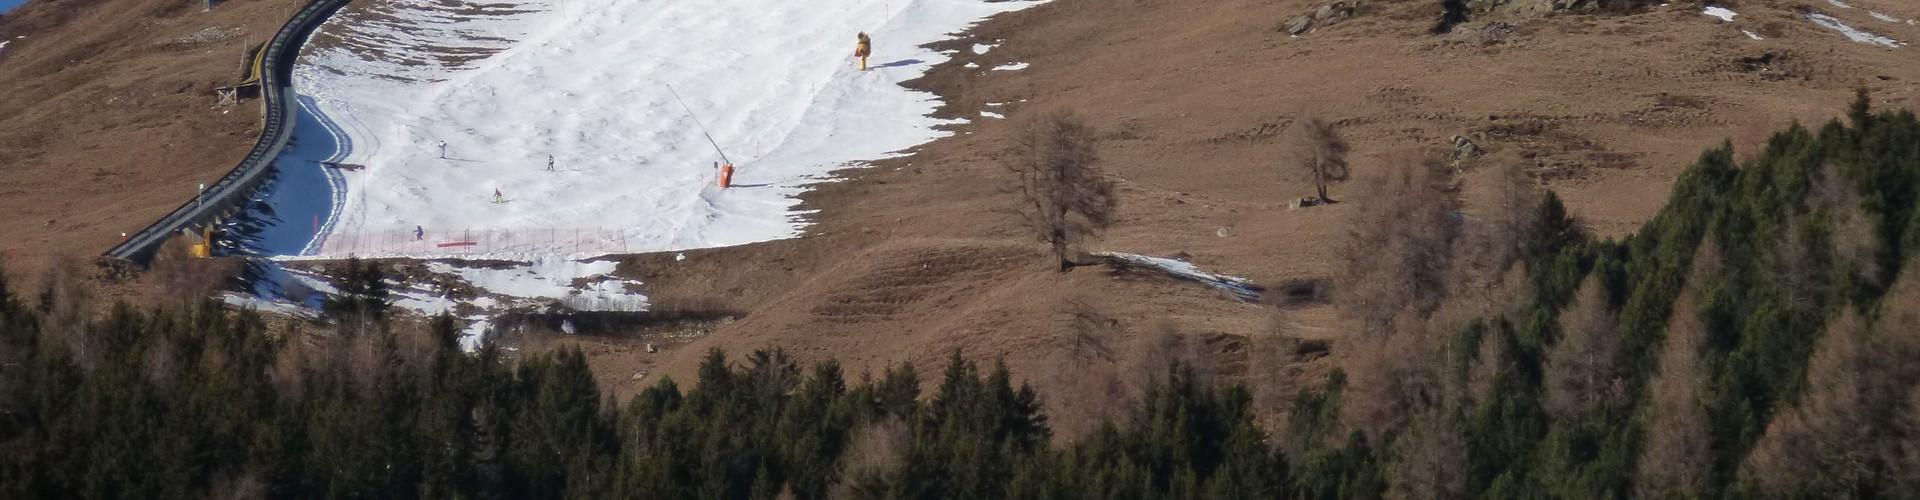 Ski slopes with little snow in Davos, December 2015 (Credit: Archiv SLF)